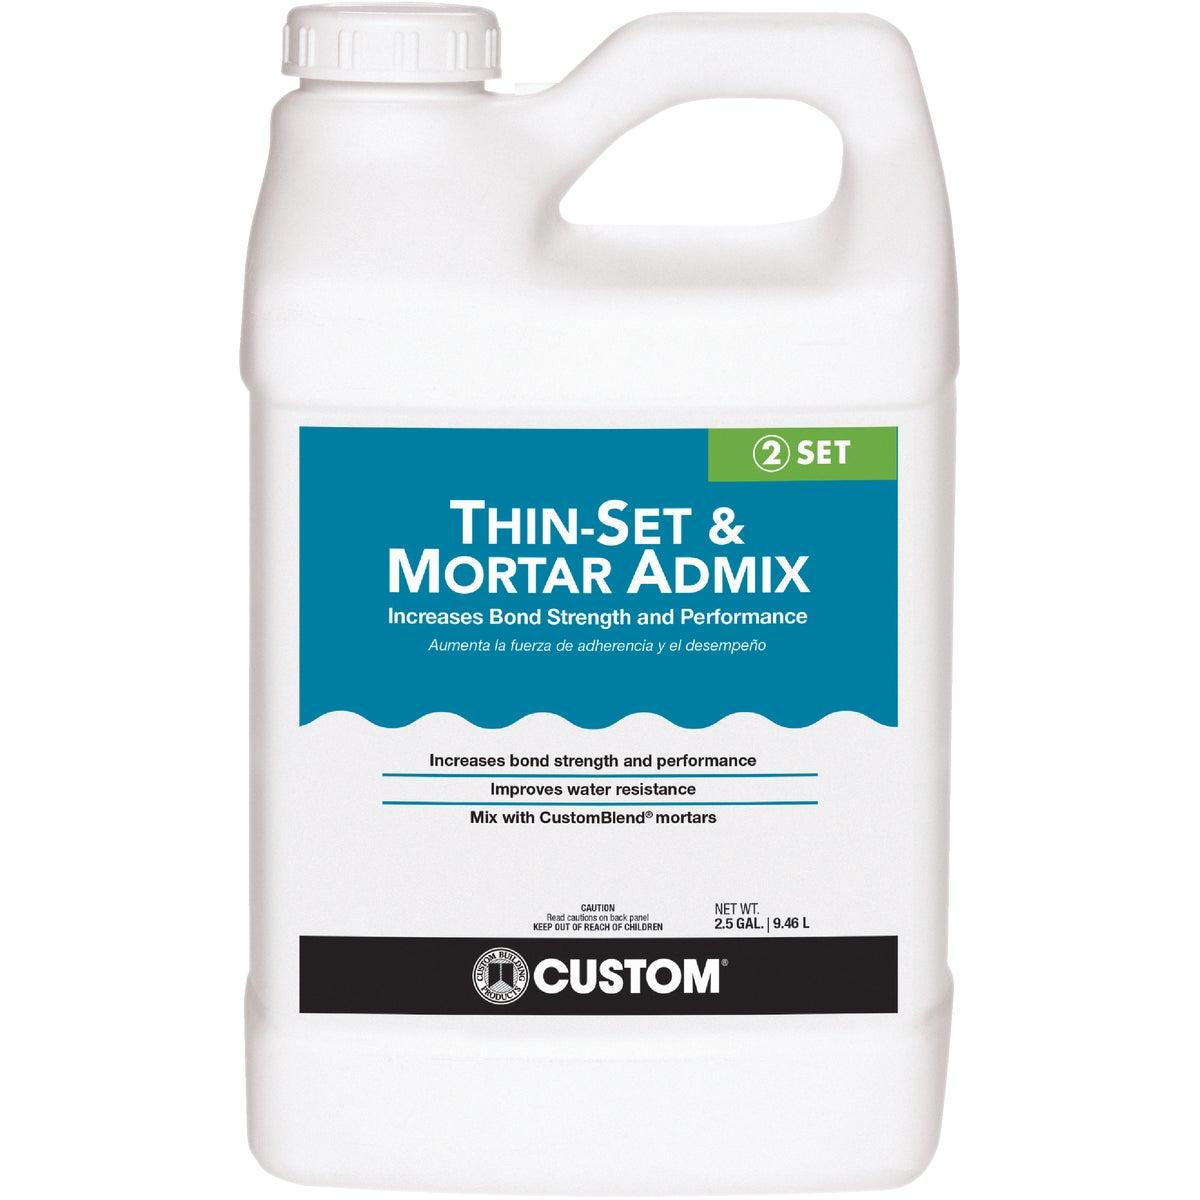 2.5GL THSET MORTAR ADMIX - AMA2 by Custom Building Prod